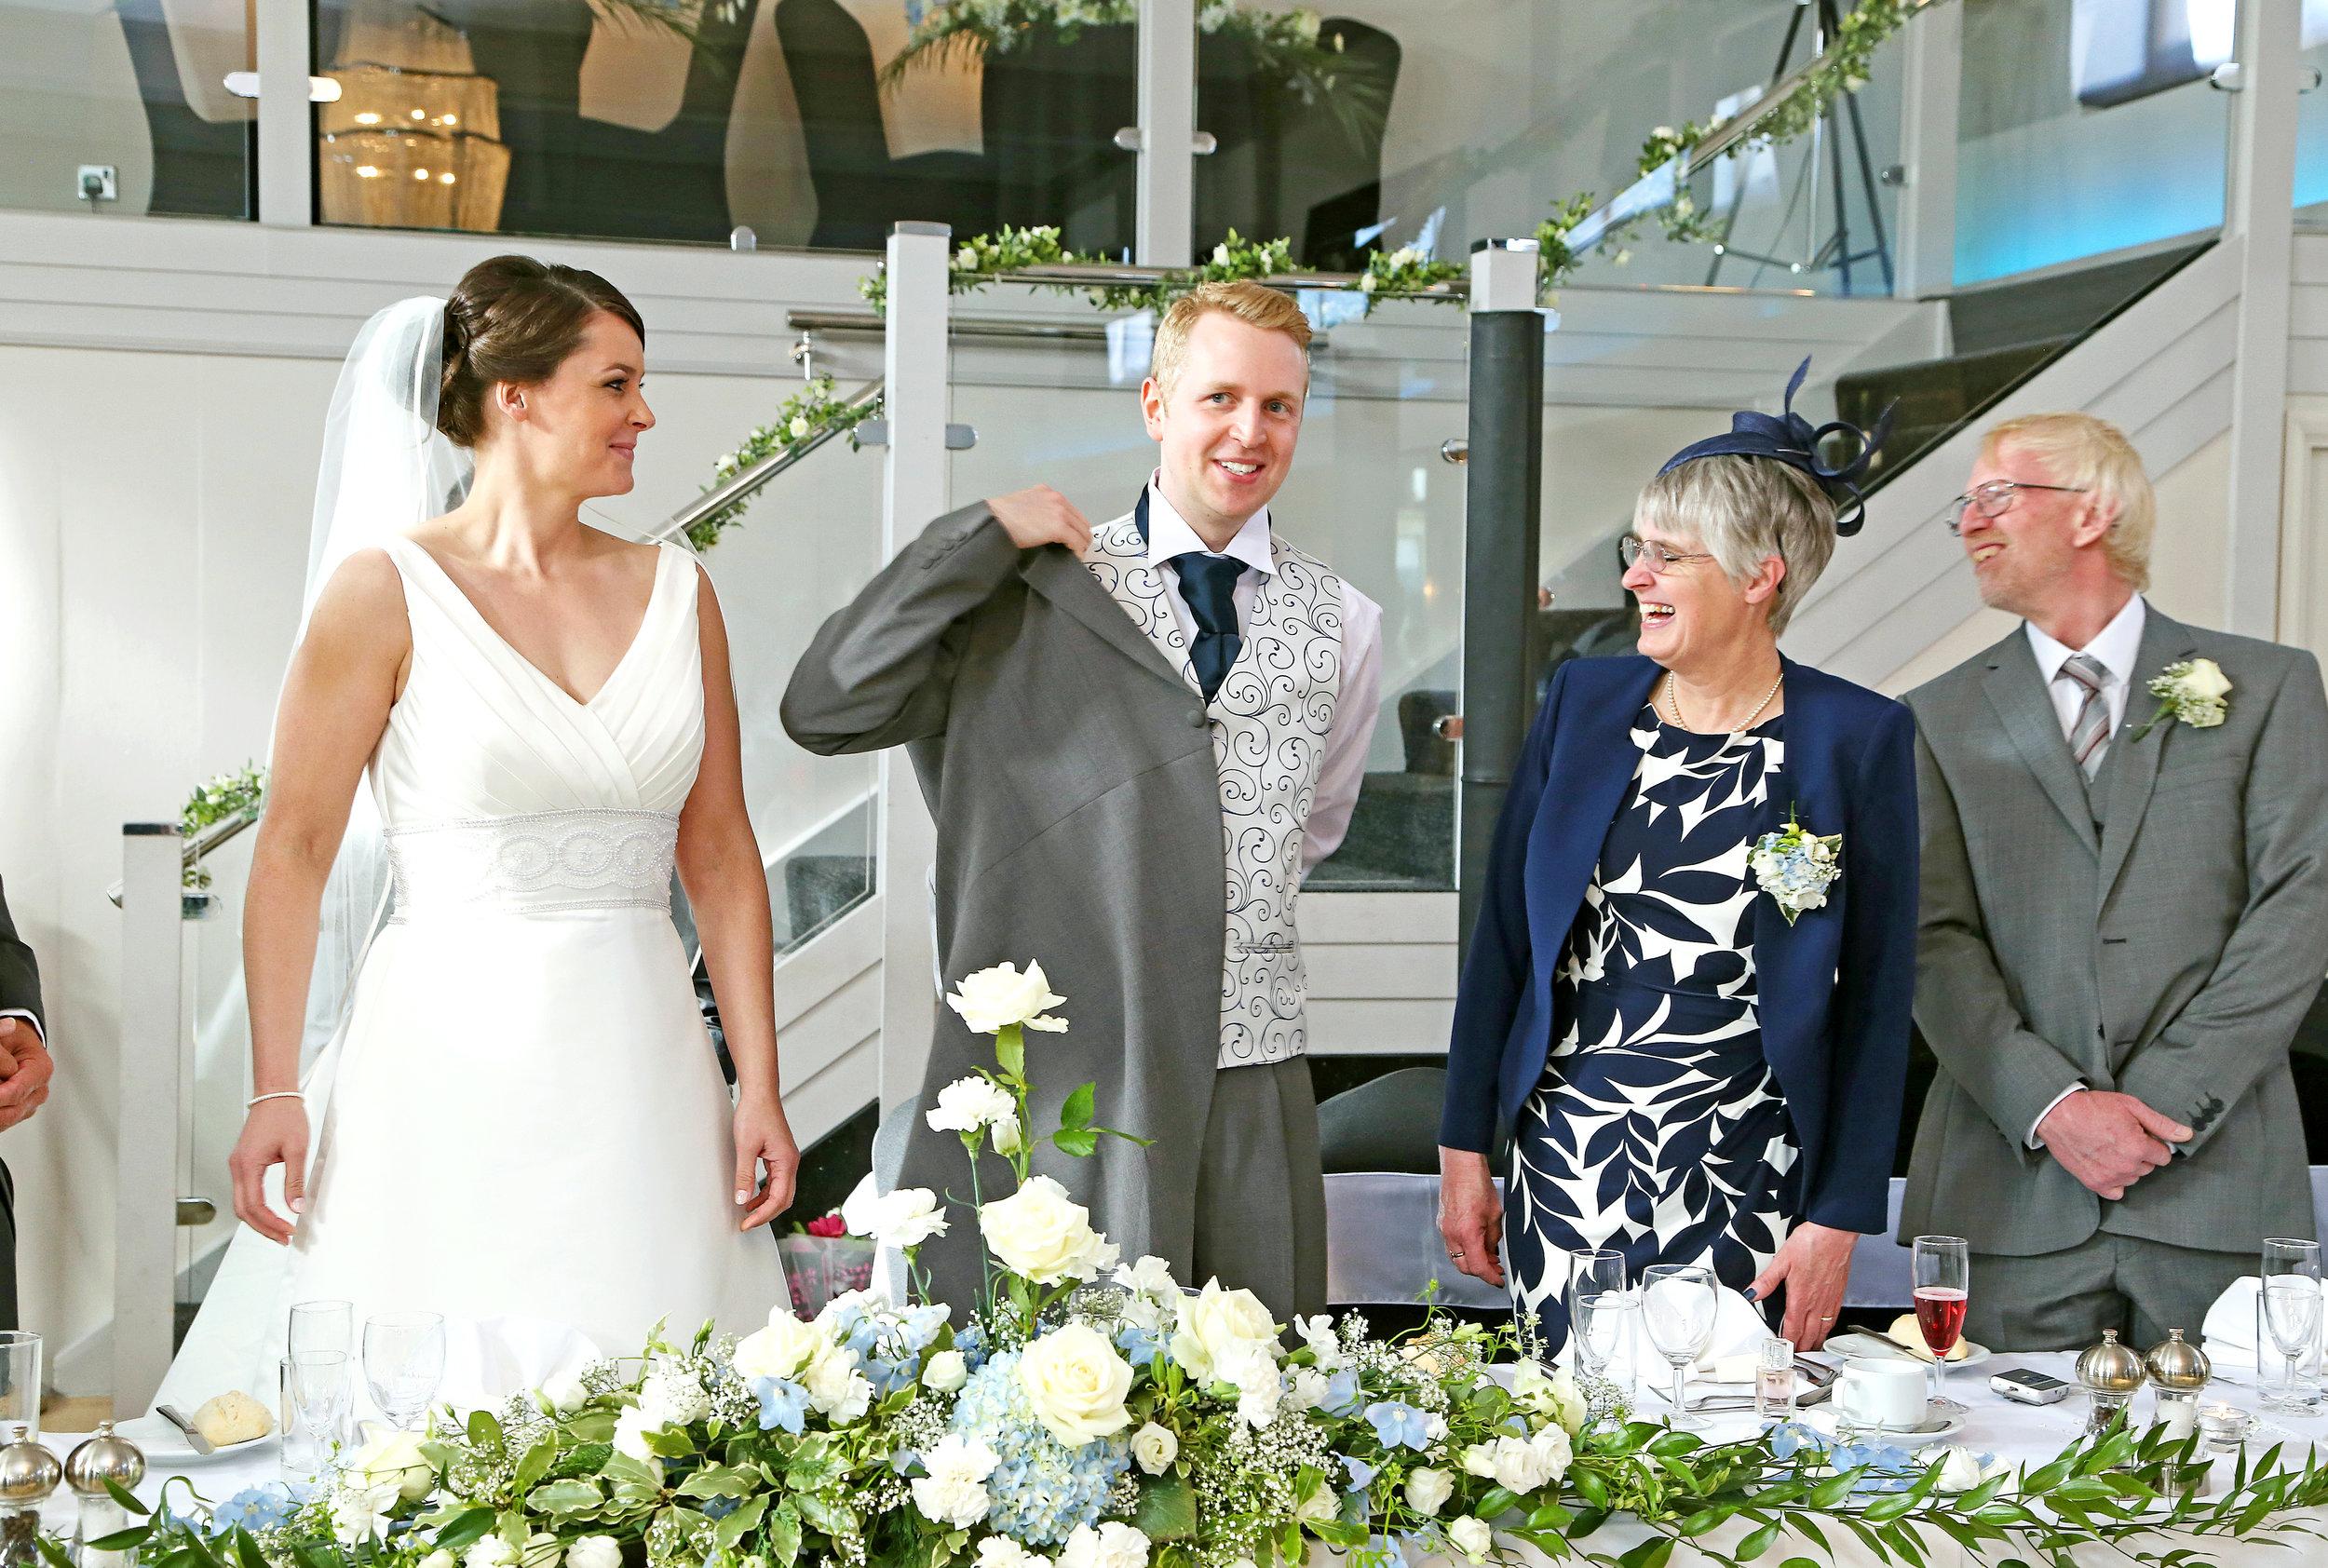 Bride Groom and Family Arlington Ballroom Wedding.jpg